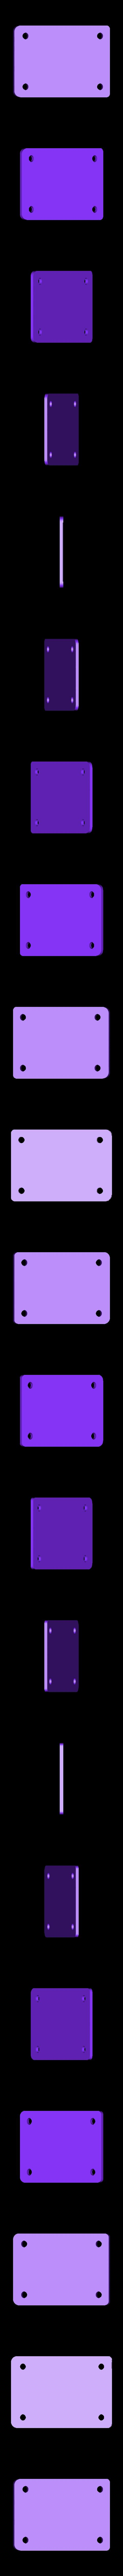 triser-pad.stl Download free STL file NeoPixel LED Truck Riser for Skateboard Longboard • 3D printable object, Adafruit